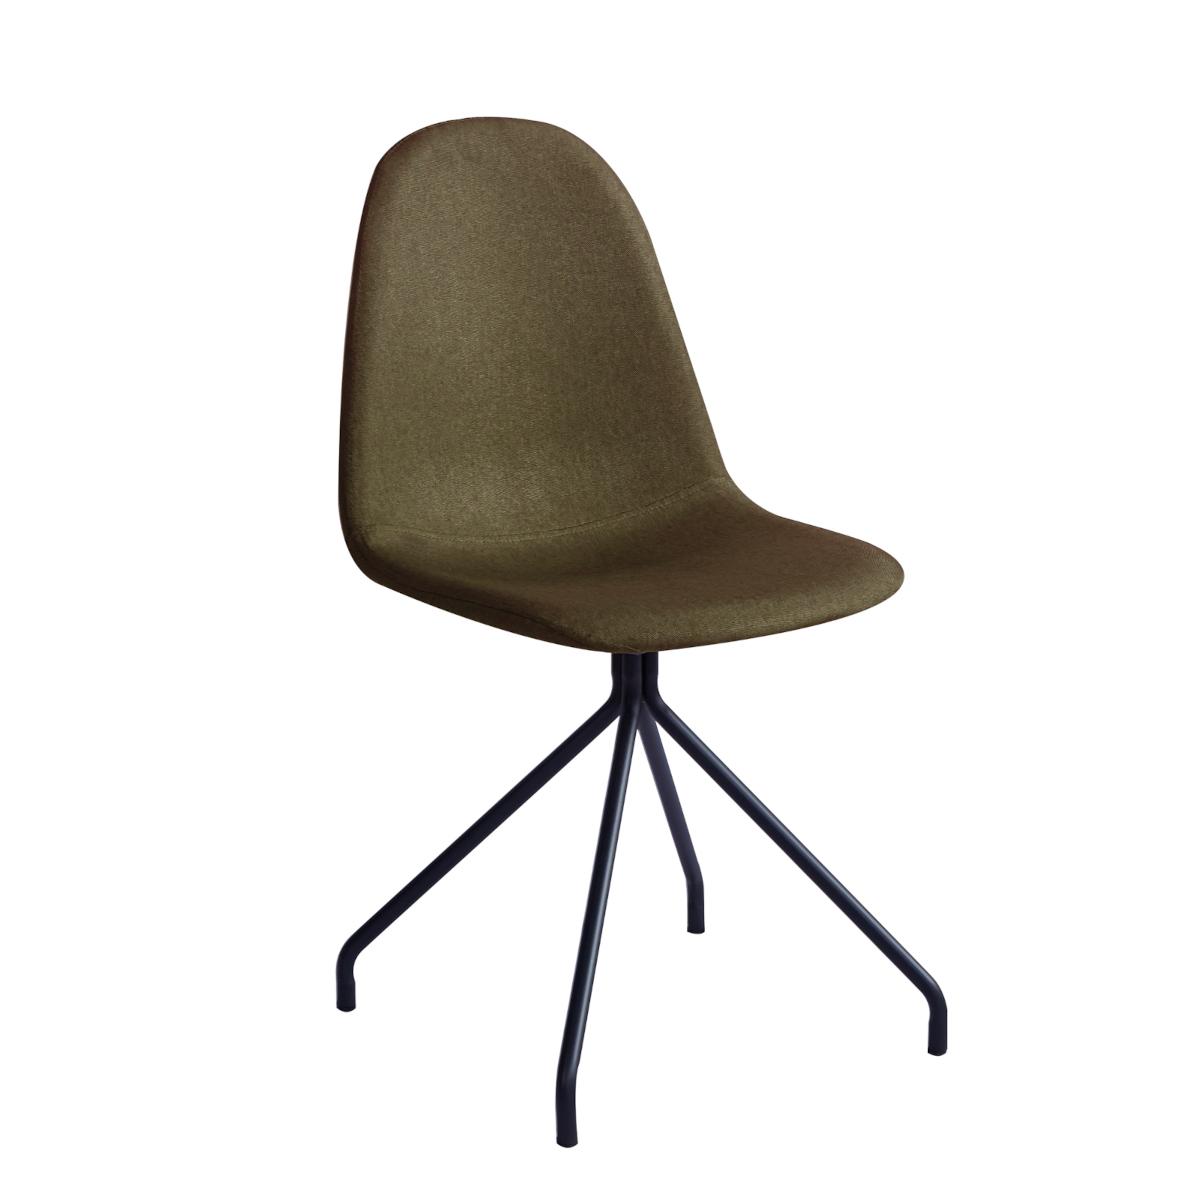 92151 SVITA 2er Set Esszimmerstühle Polyester Oliv